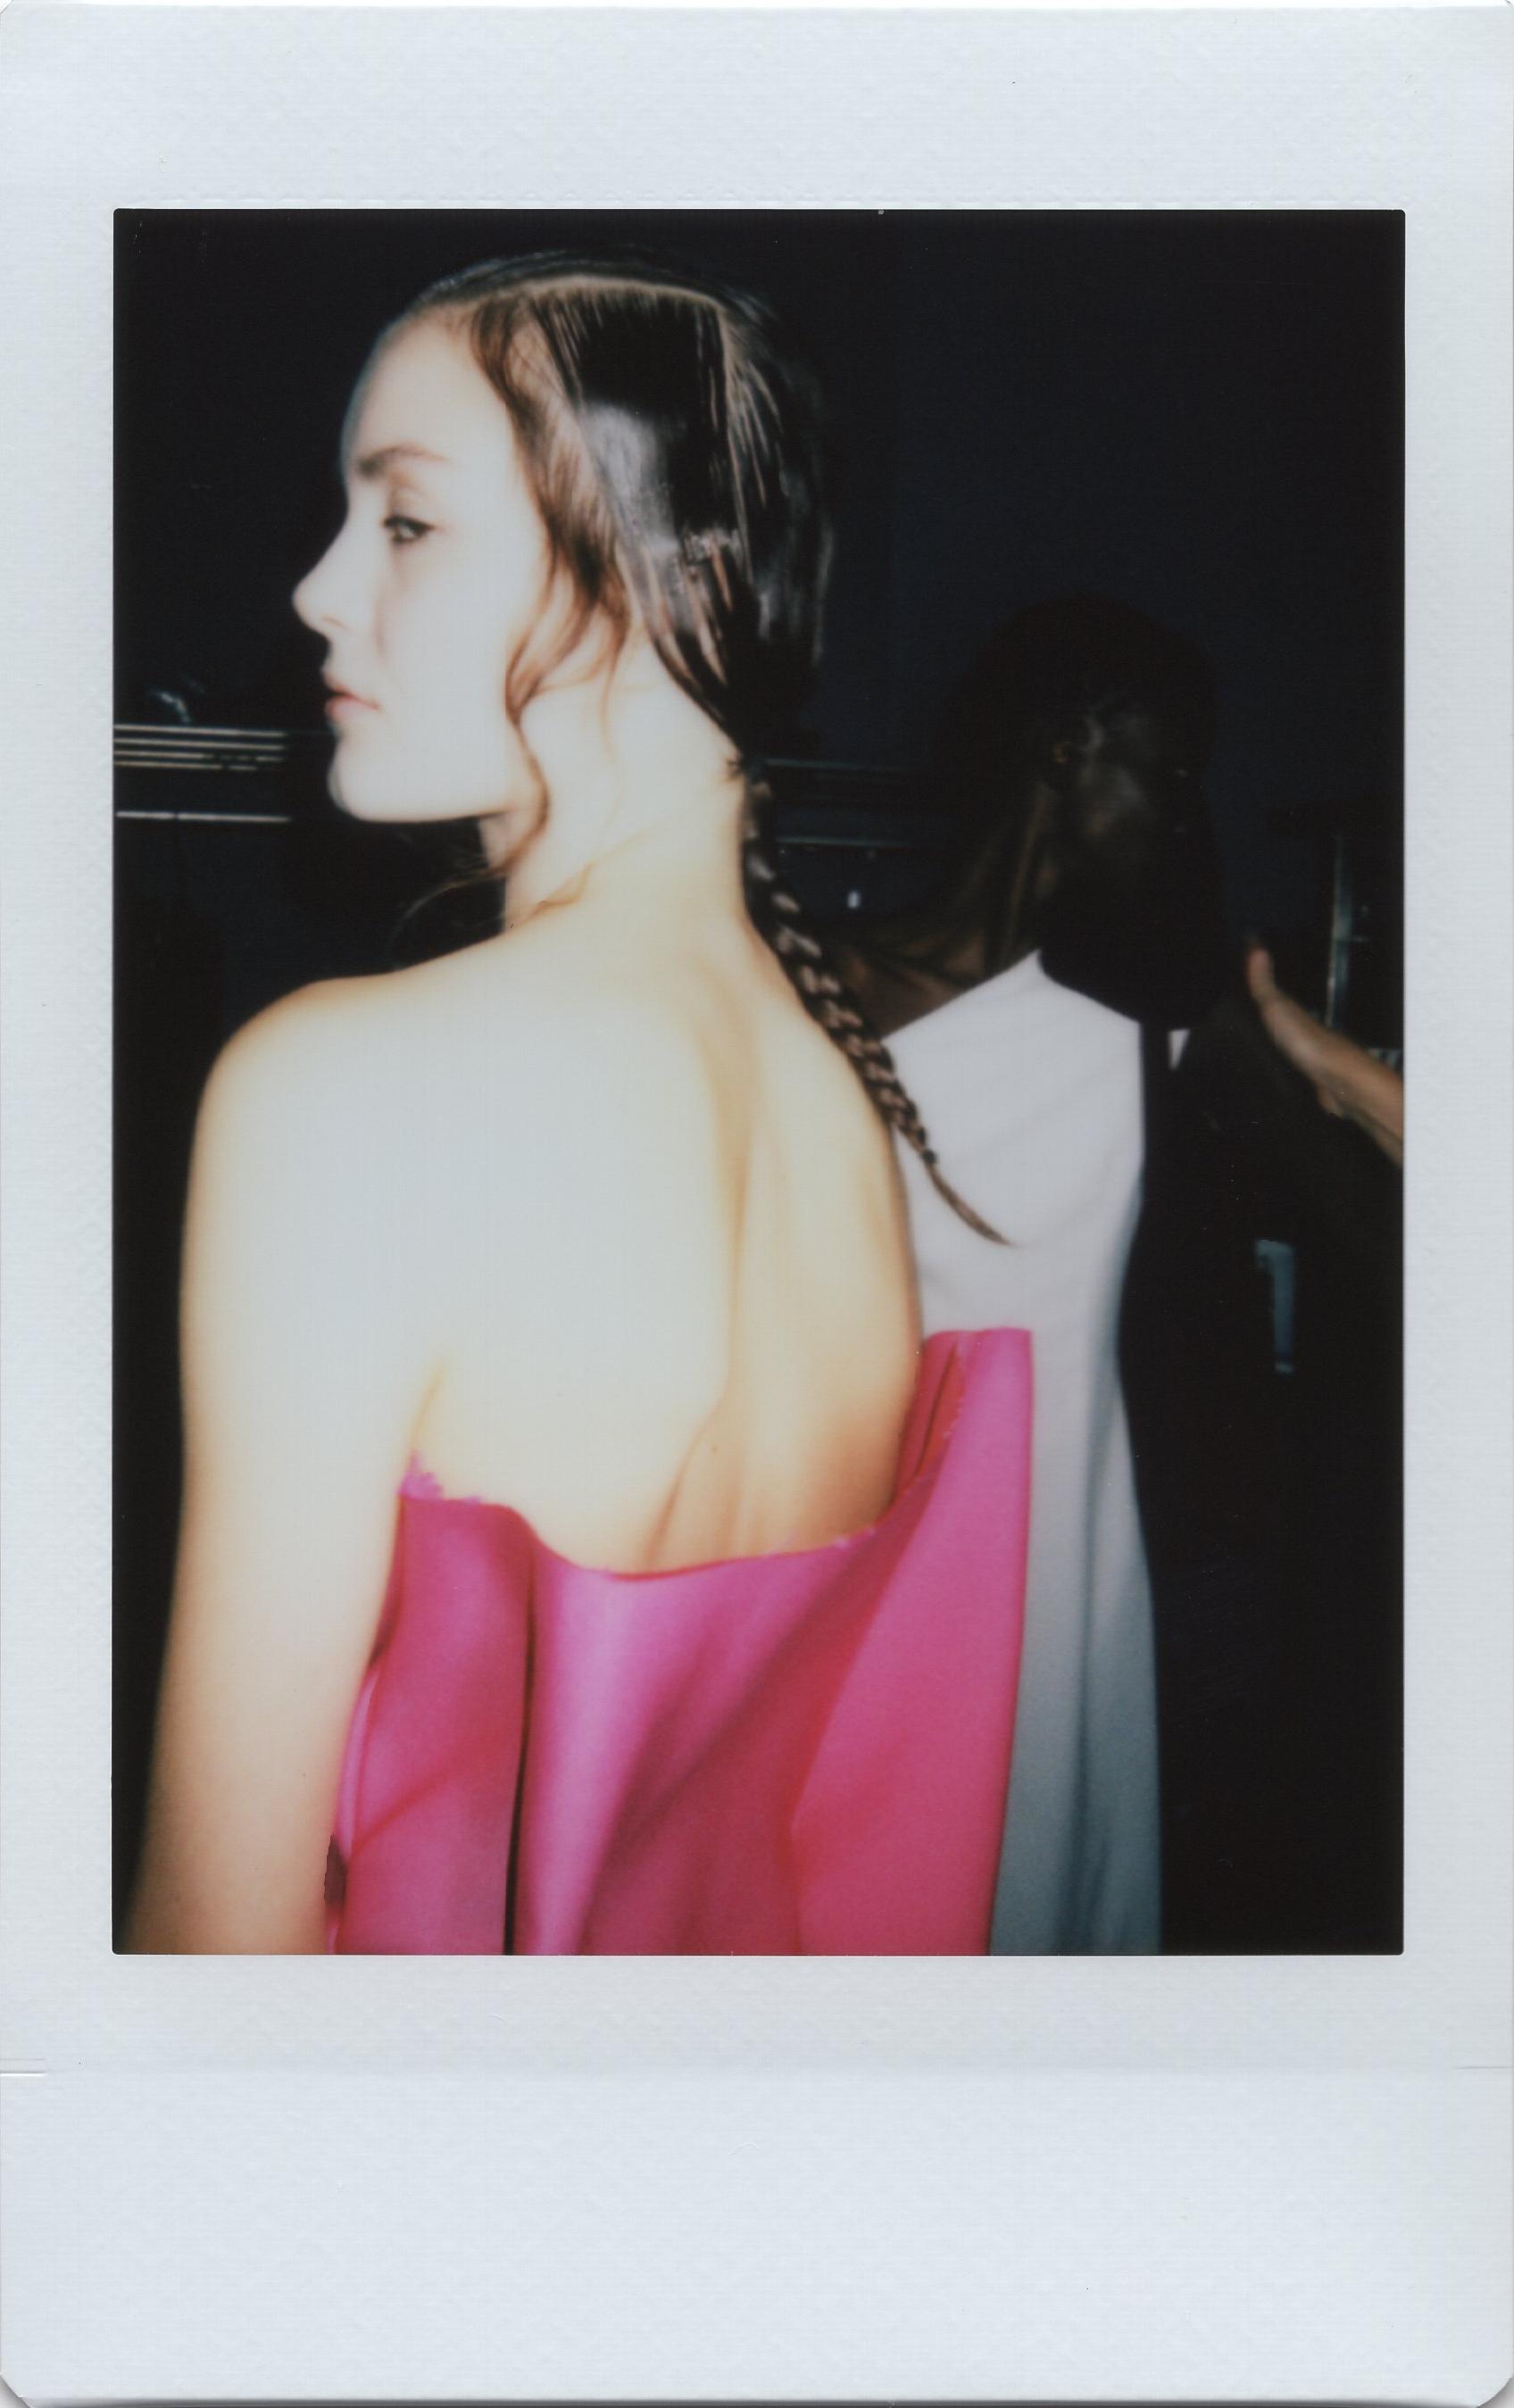 YangLi_Honigschreck_Backstage_Polaroid_1.jpg